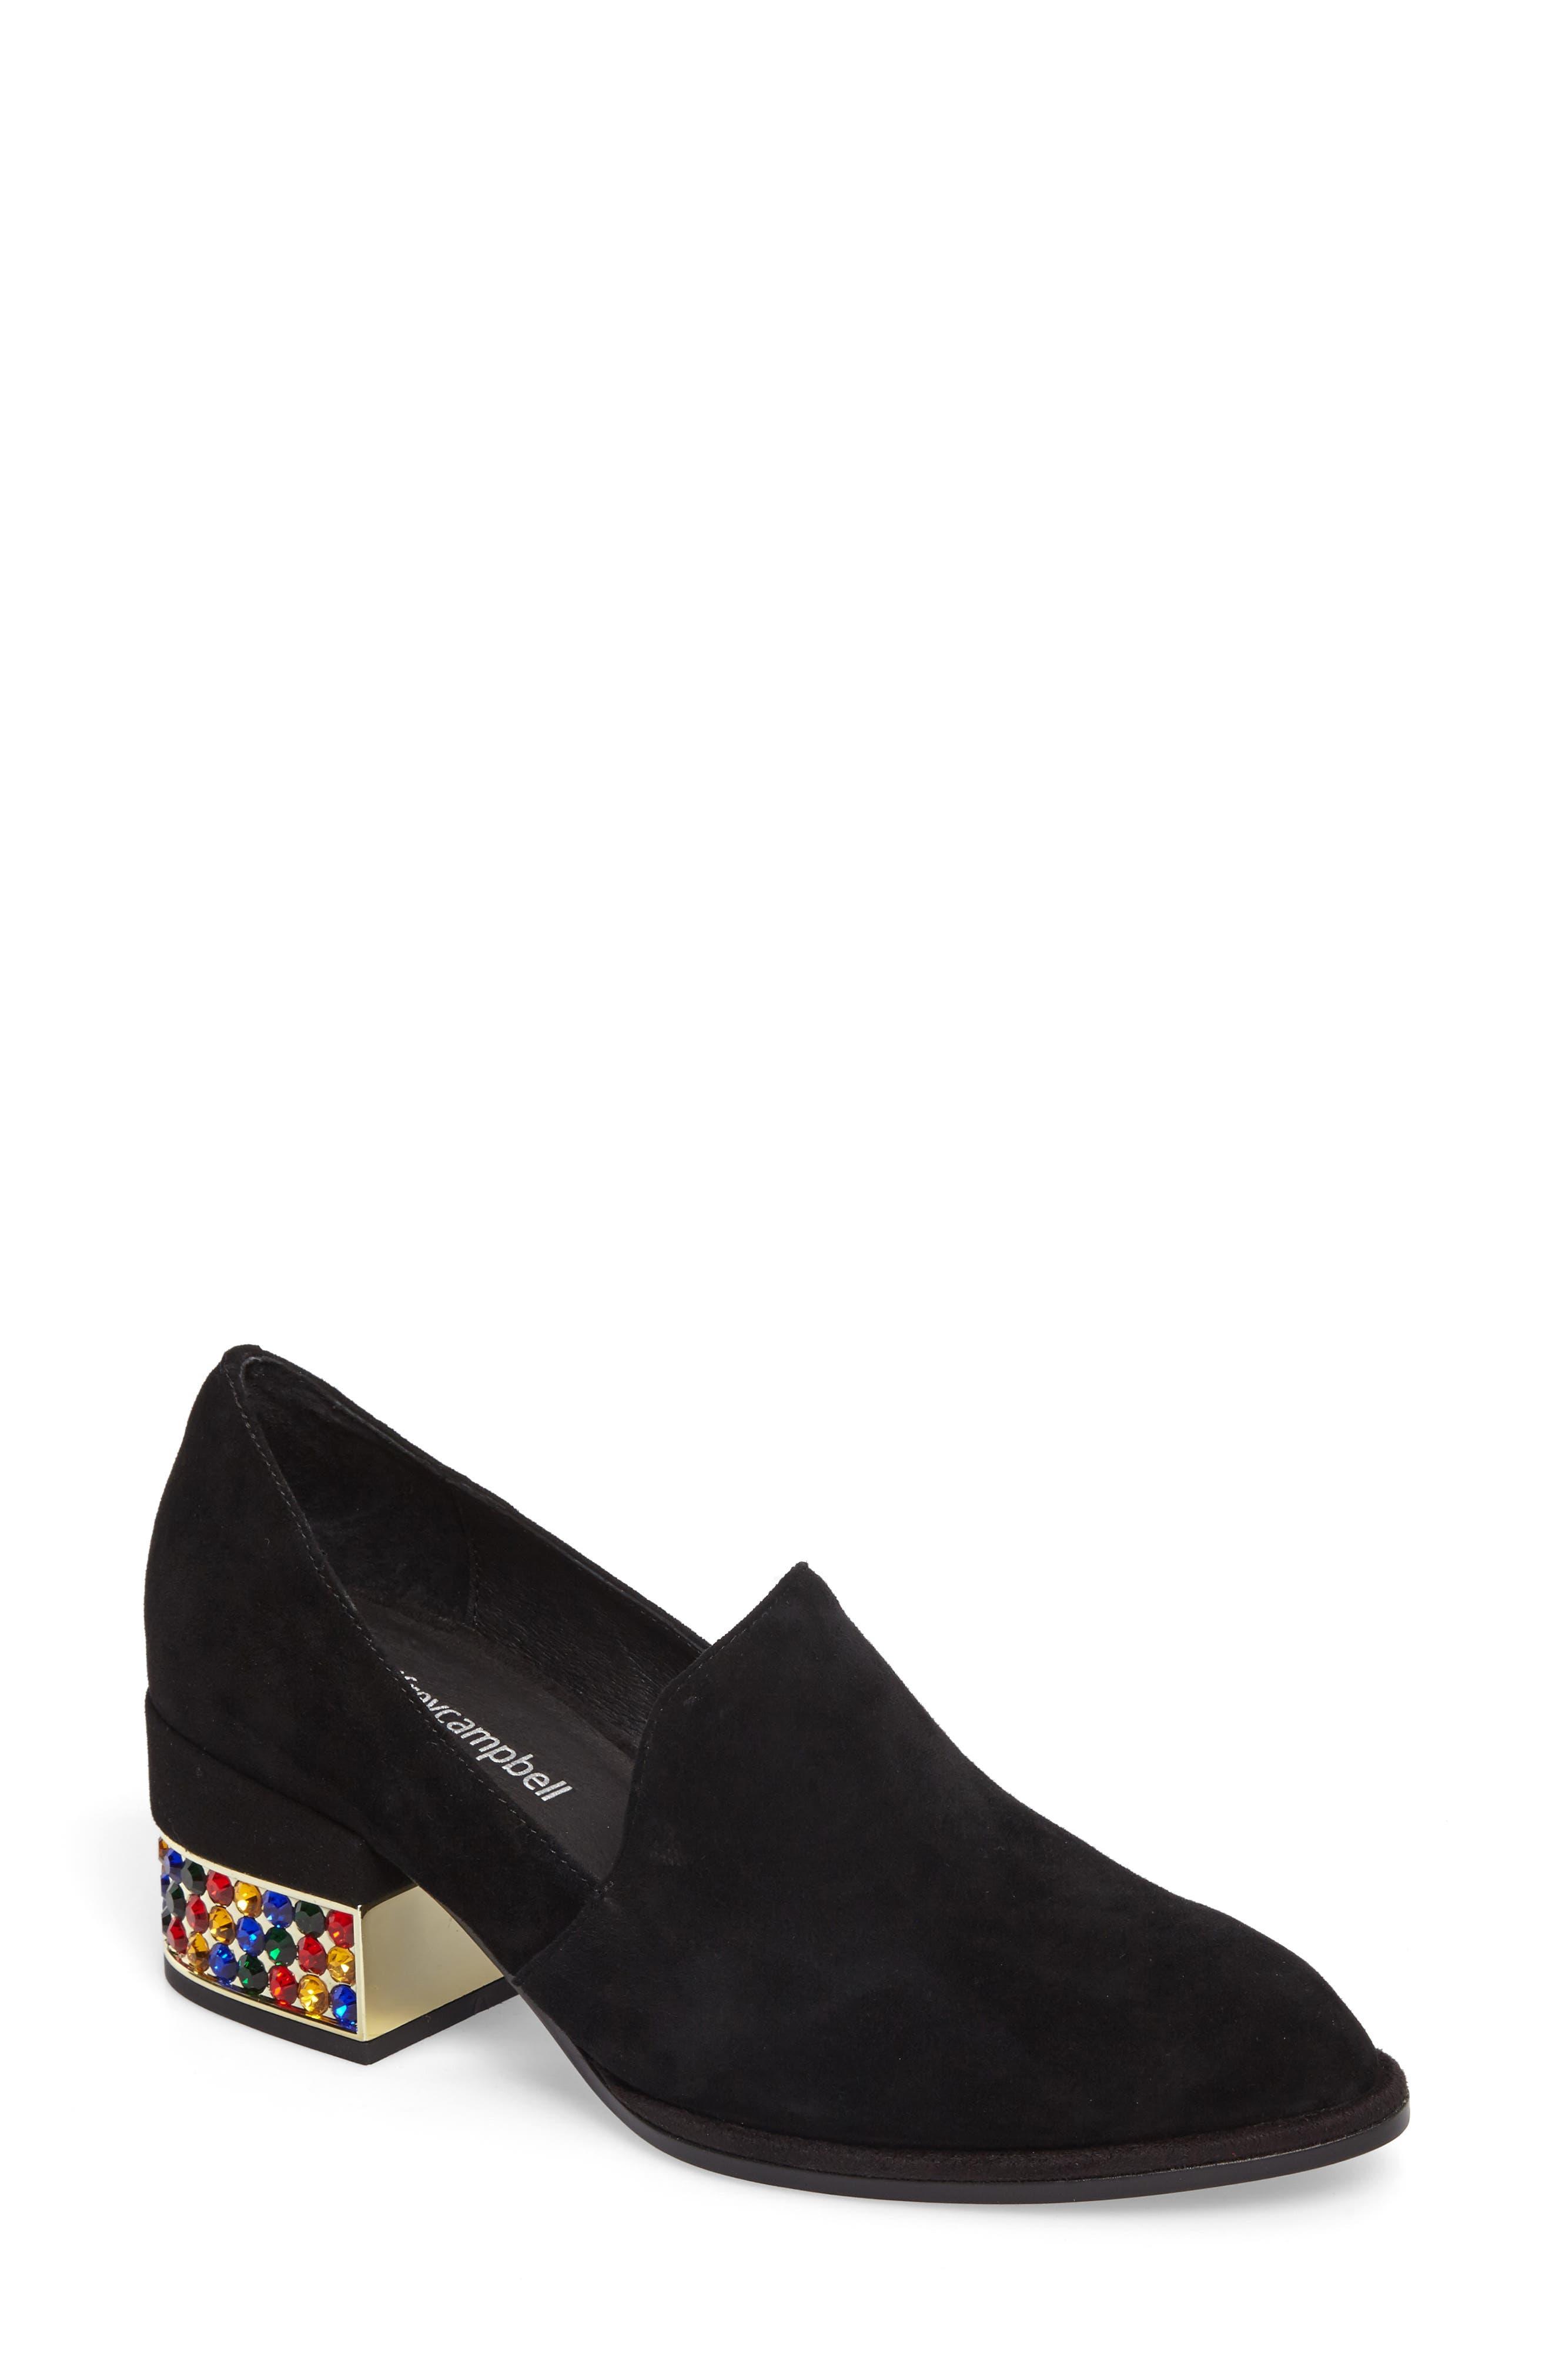 Alternate Image 1 Selected - Jeffrey Campbell Serlin Jeweled Heel Loafer (Women)